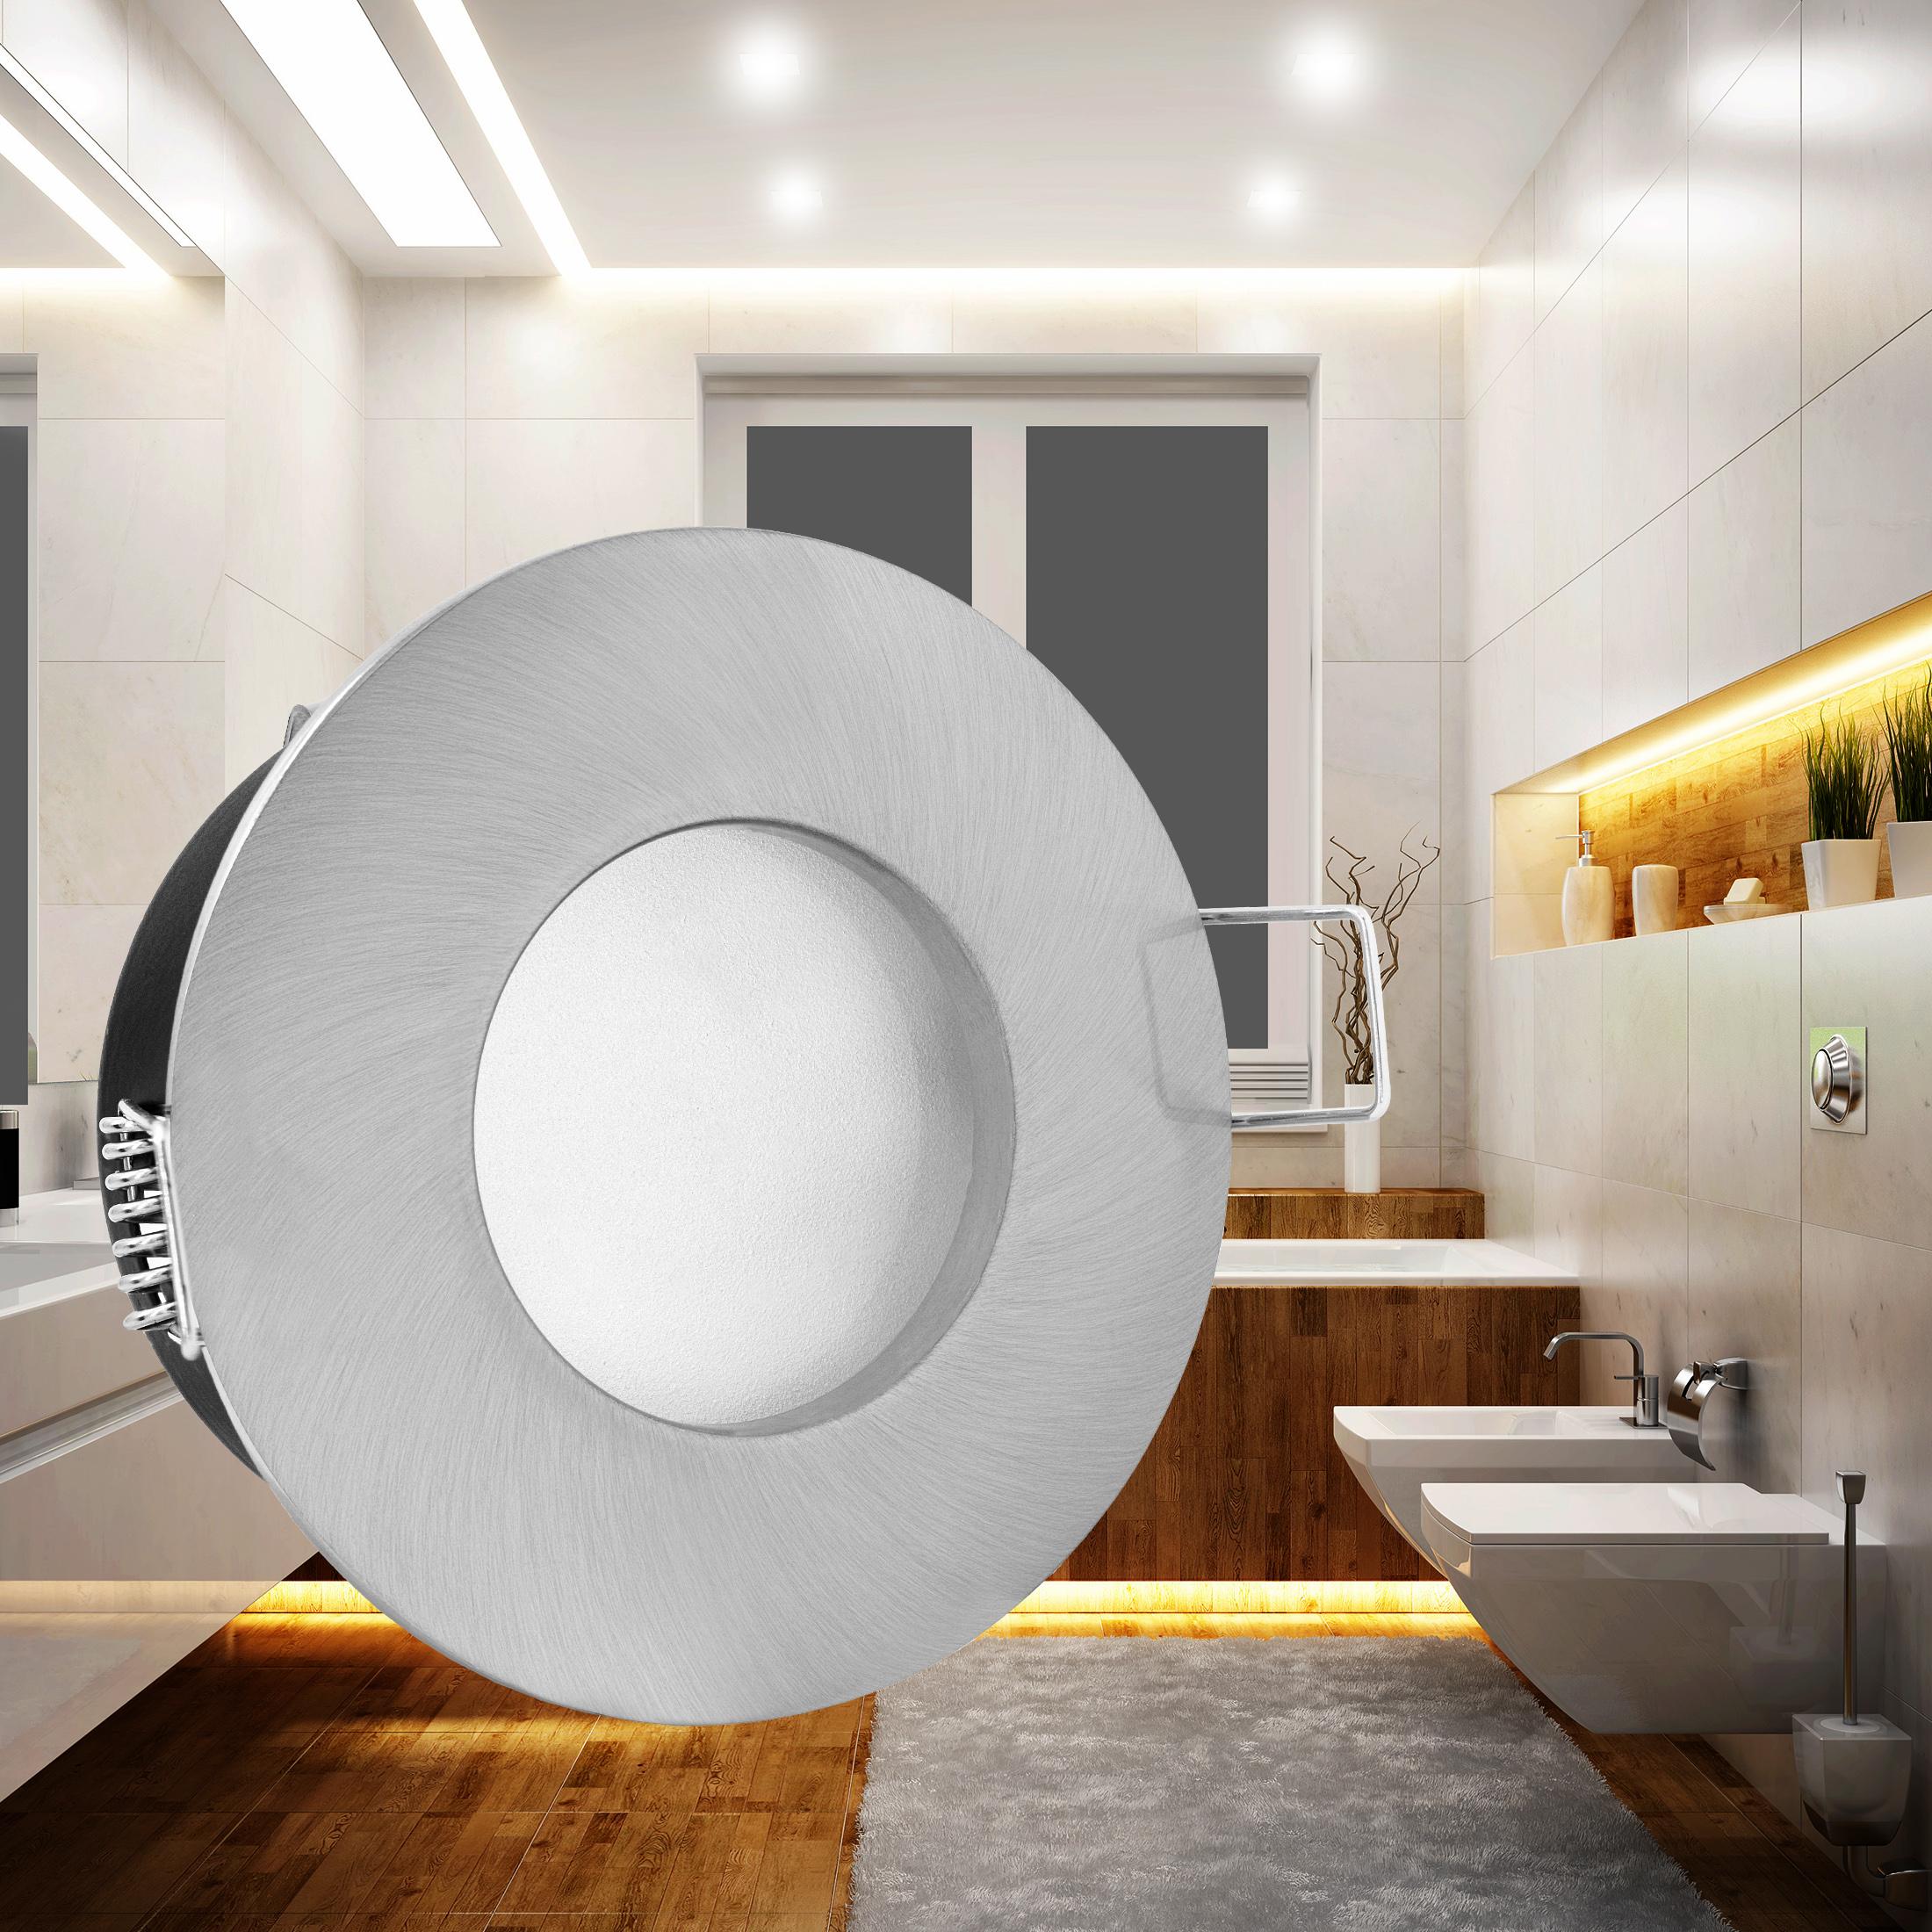 rw 1 feuchtraum led einbaustrahler bad edelstahl geb rstet 5w smd warmwei gu10 230v ip65. Black Bedroom Furniture Sets. Home Design Ideas